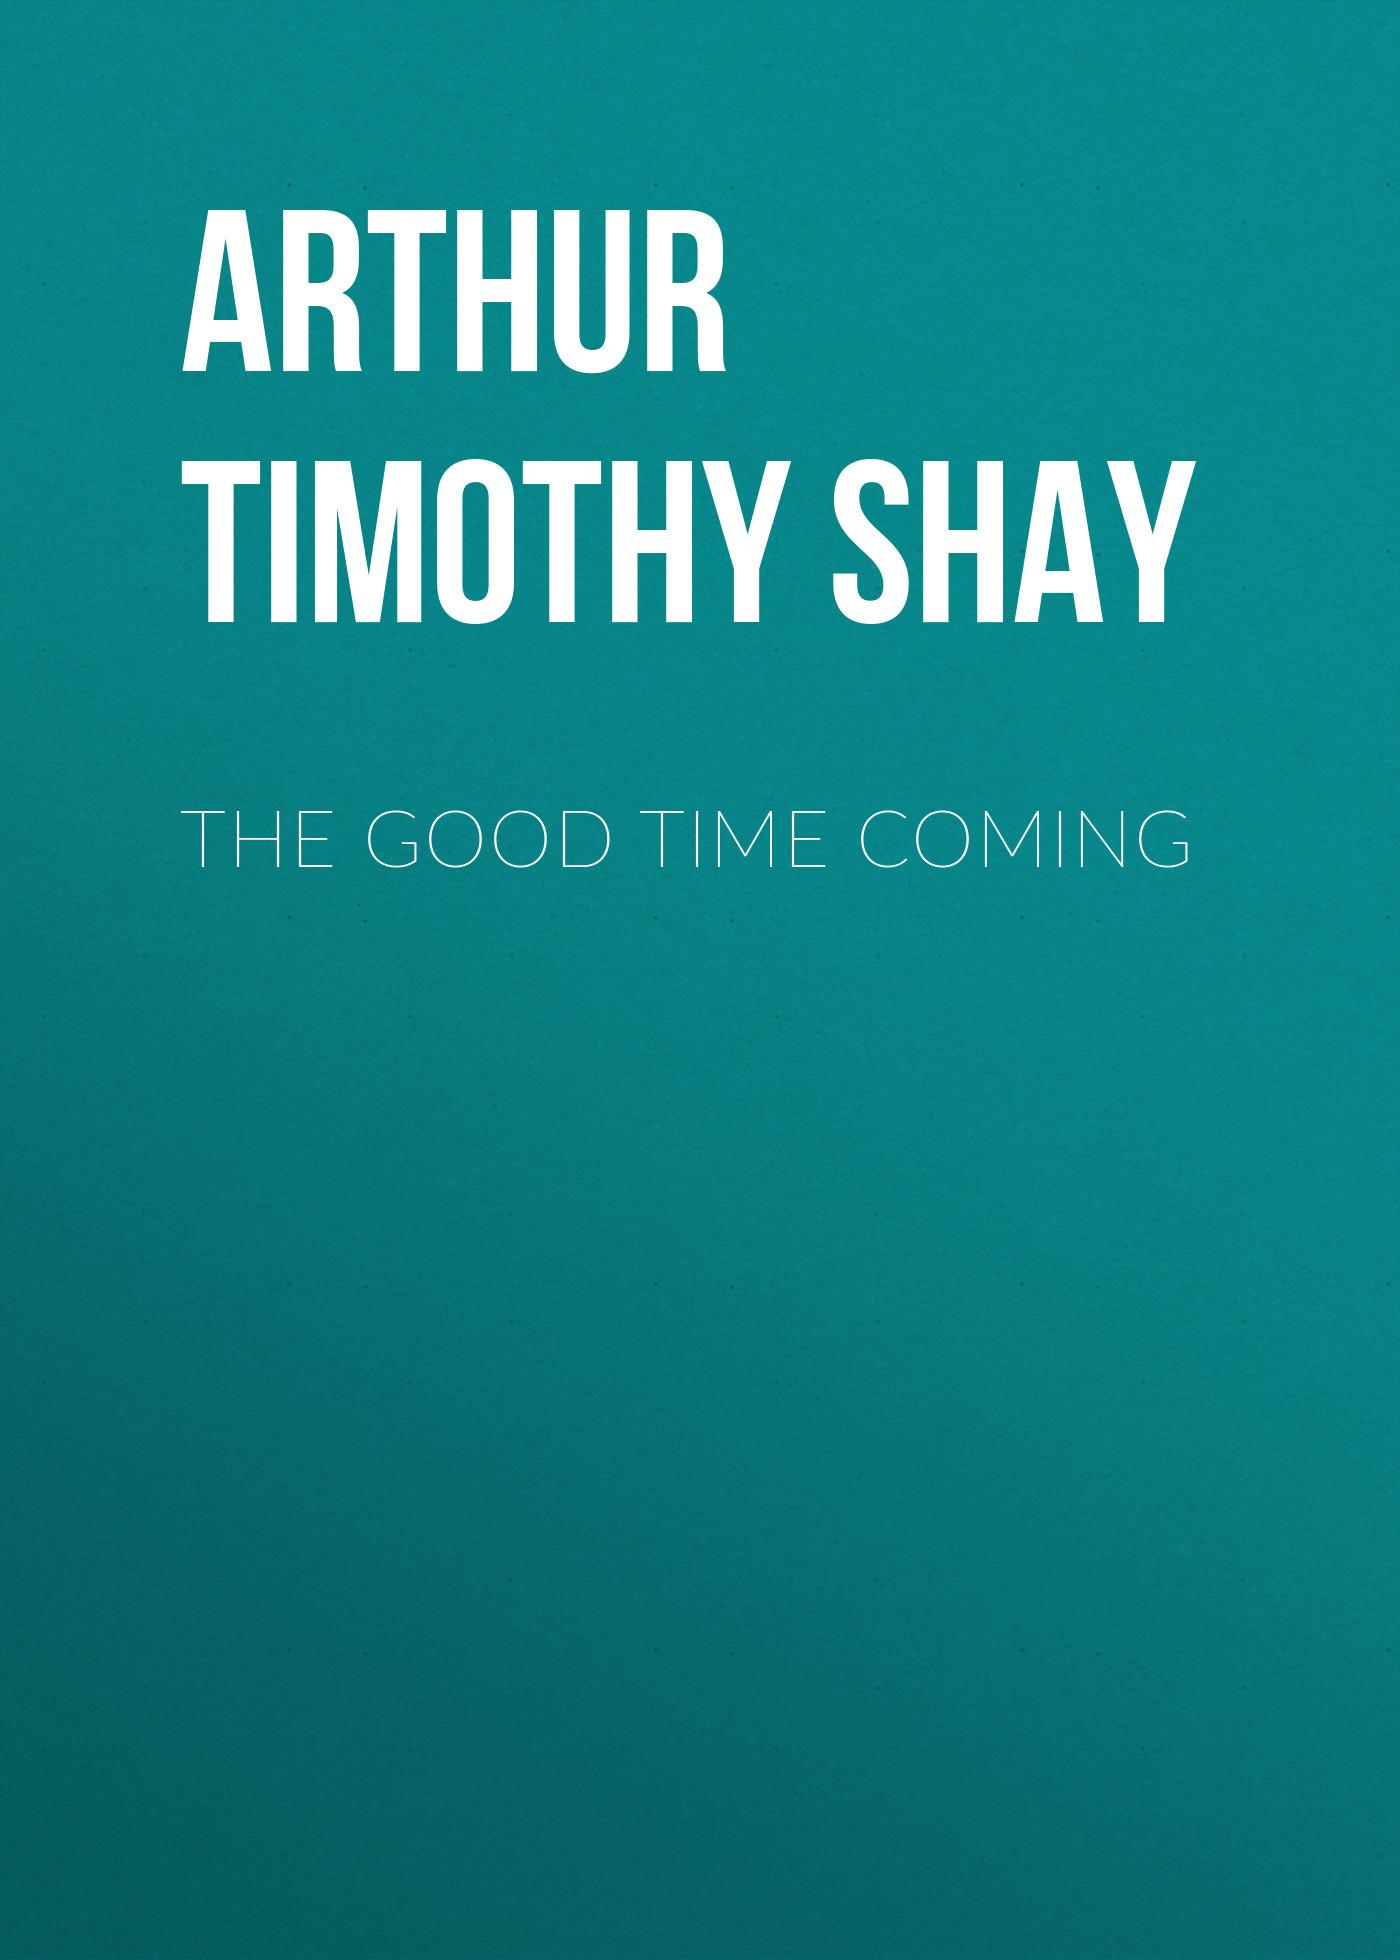 Arthur Timothy Shay The Good Time Coming цена в Москве и Питере